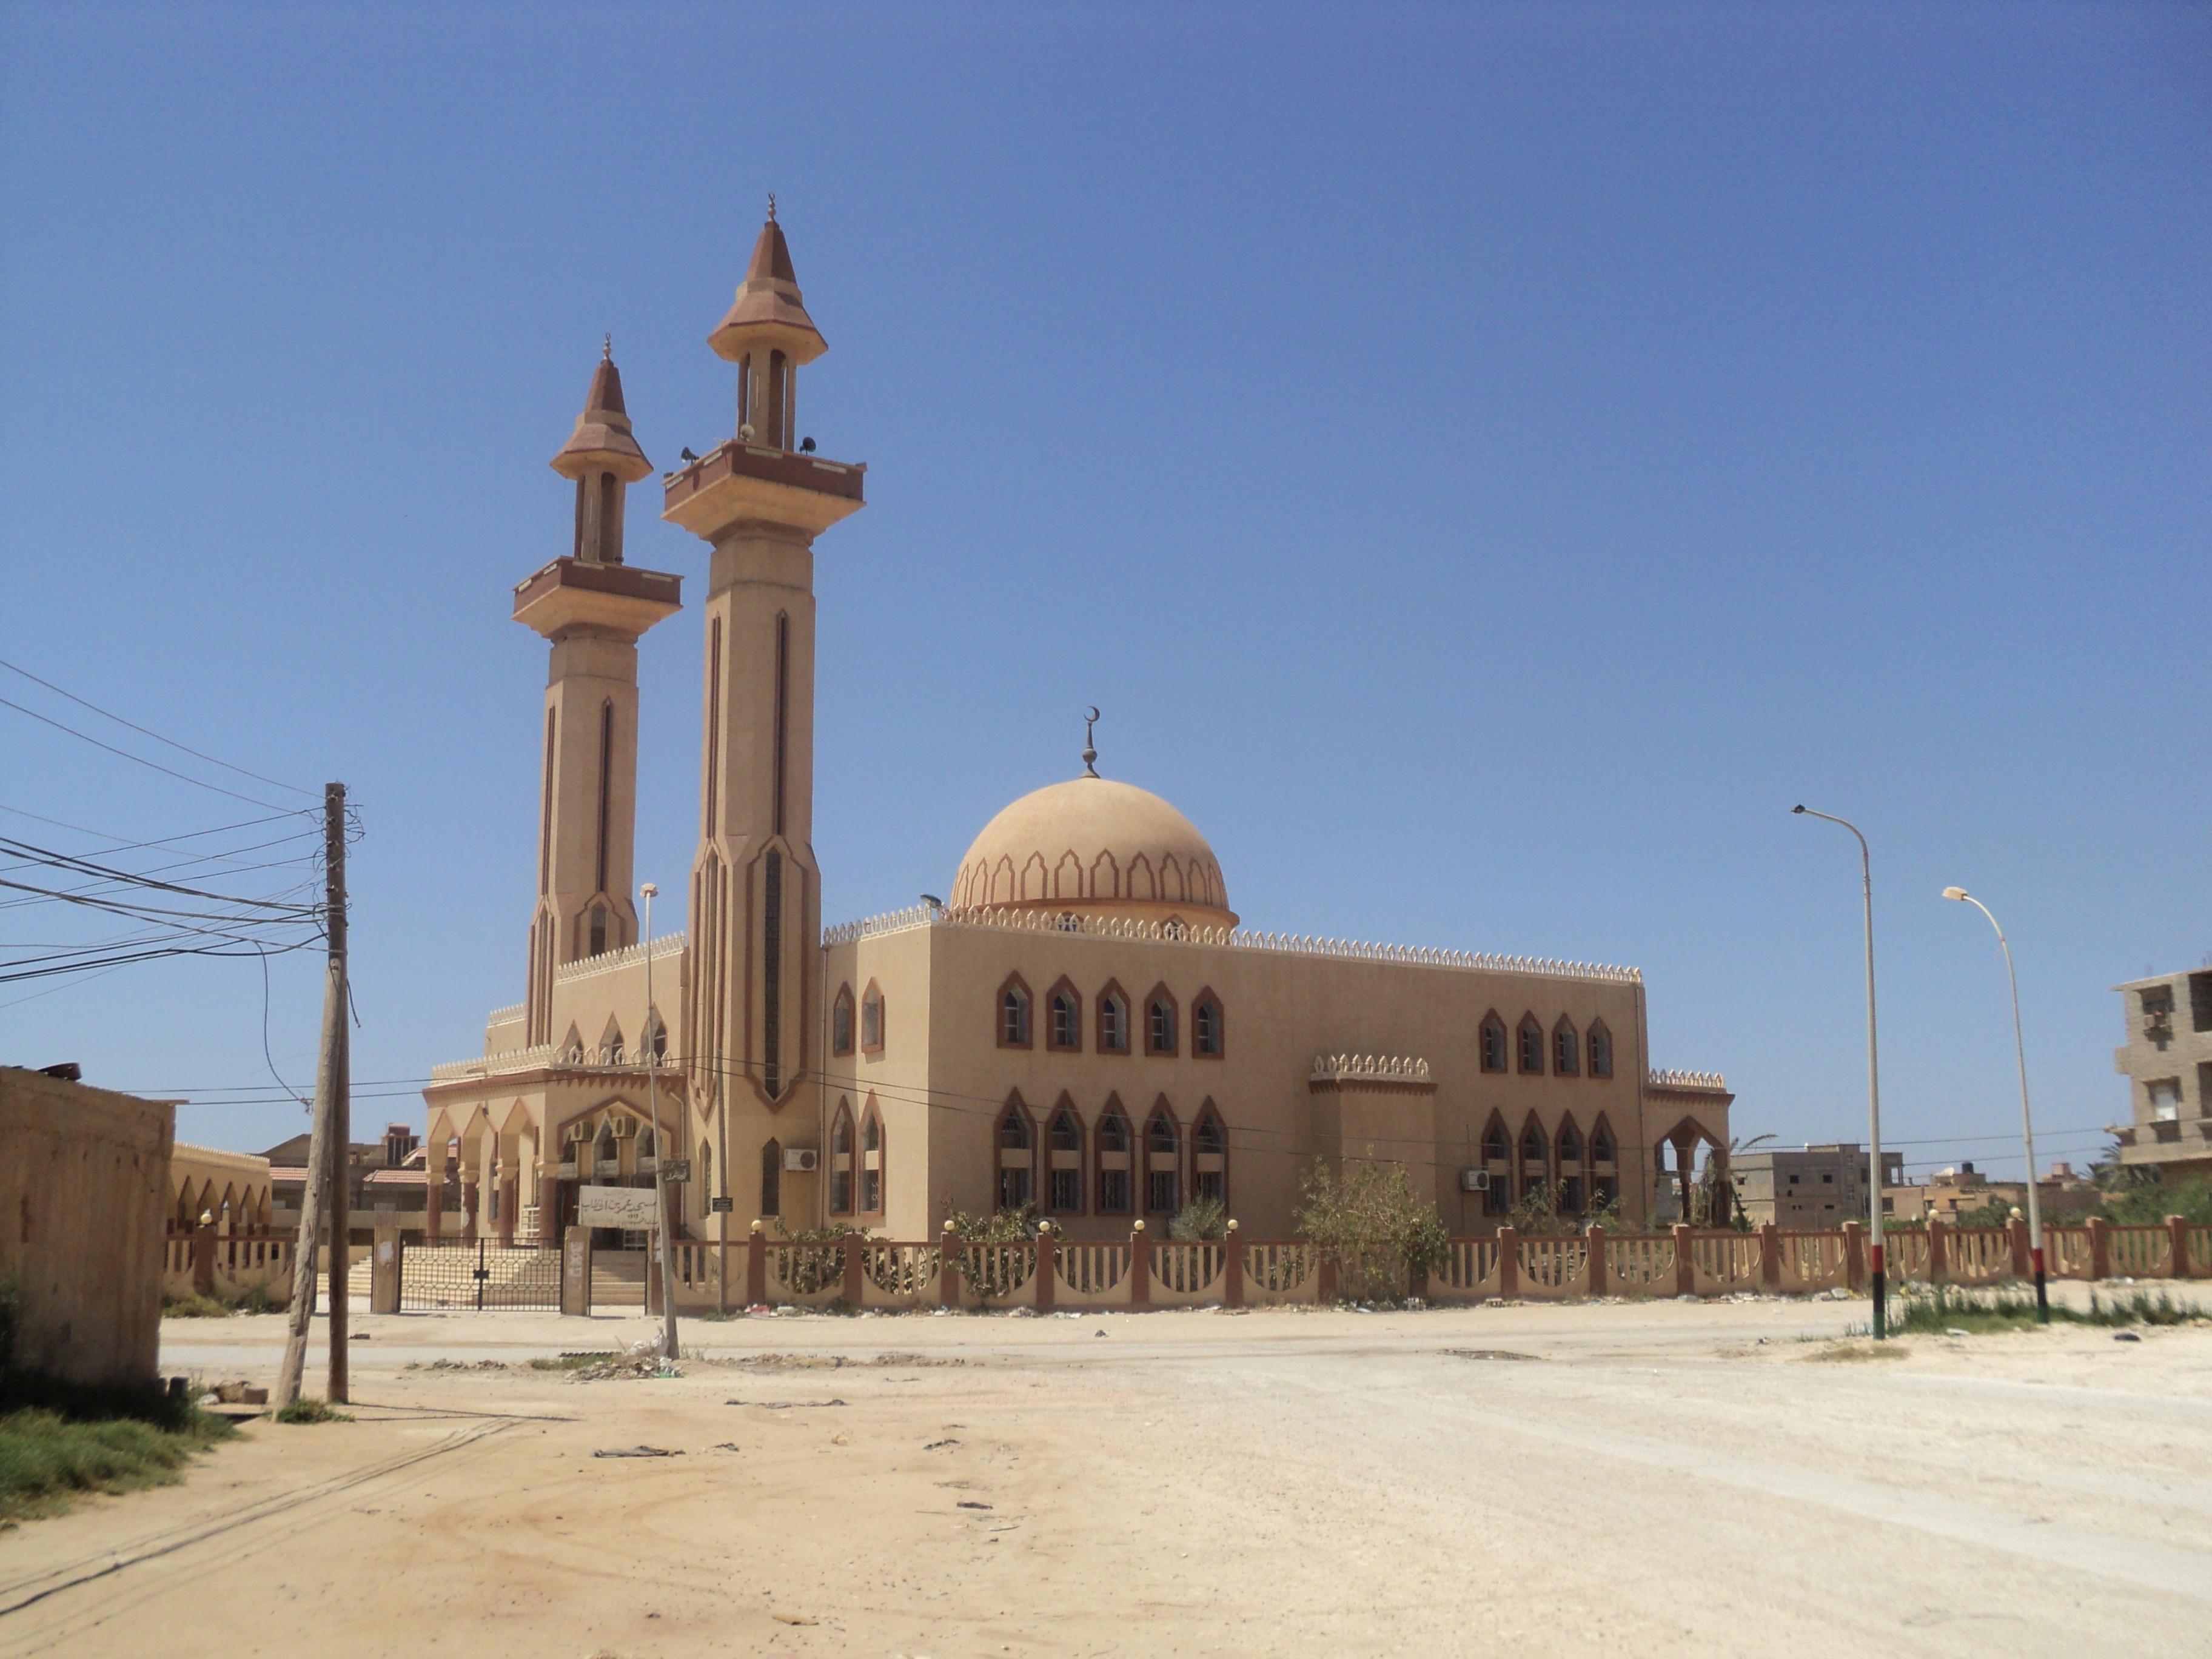 File:Omar ibn Al Khattab mosque, Benghazi JPG - Wikimedia